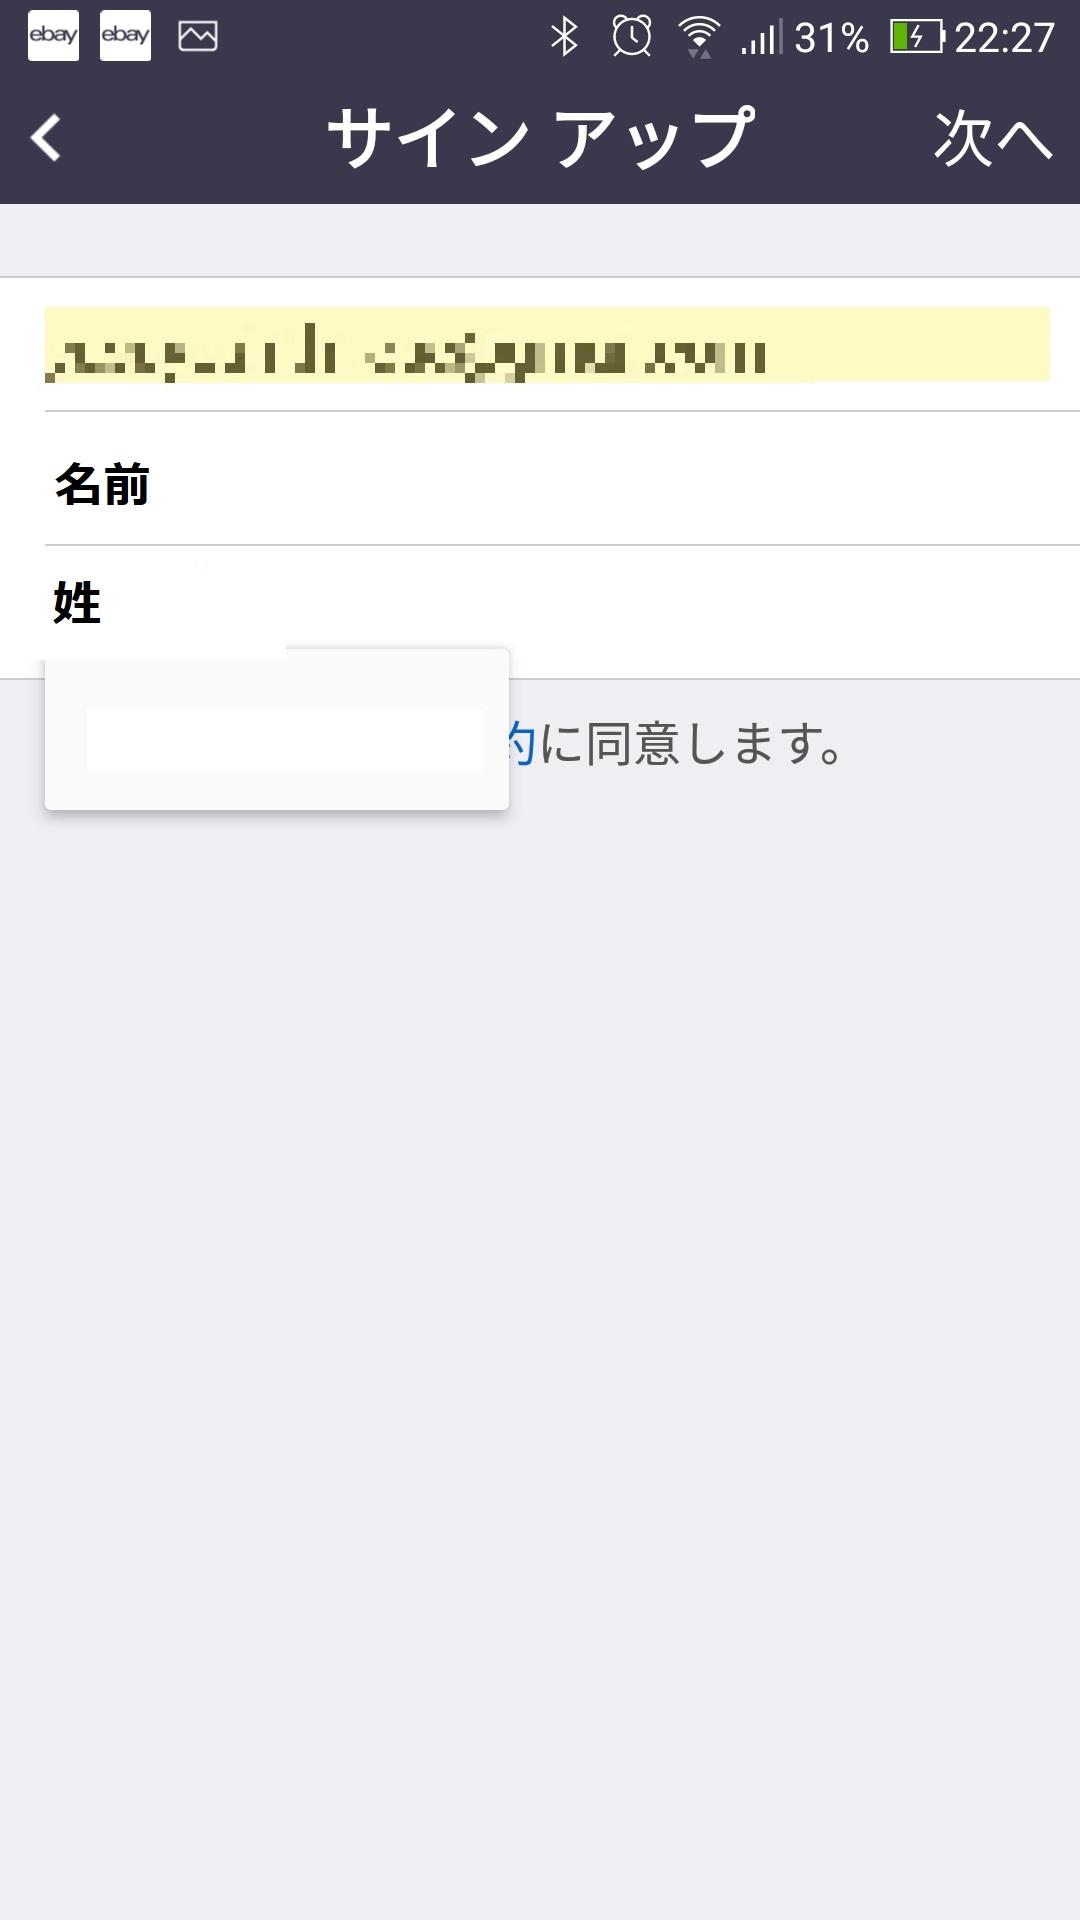 Screenshot 20200416 222746 - Zoomの使い方~一人で総合セルフチェック(パソコンとスマホを使って自分で)